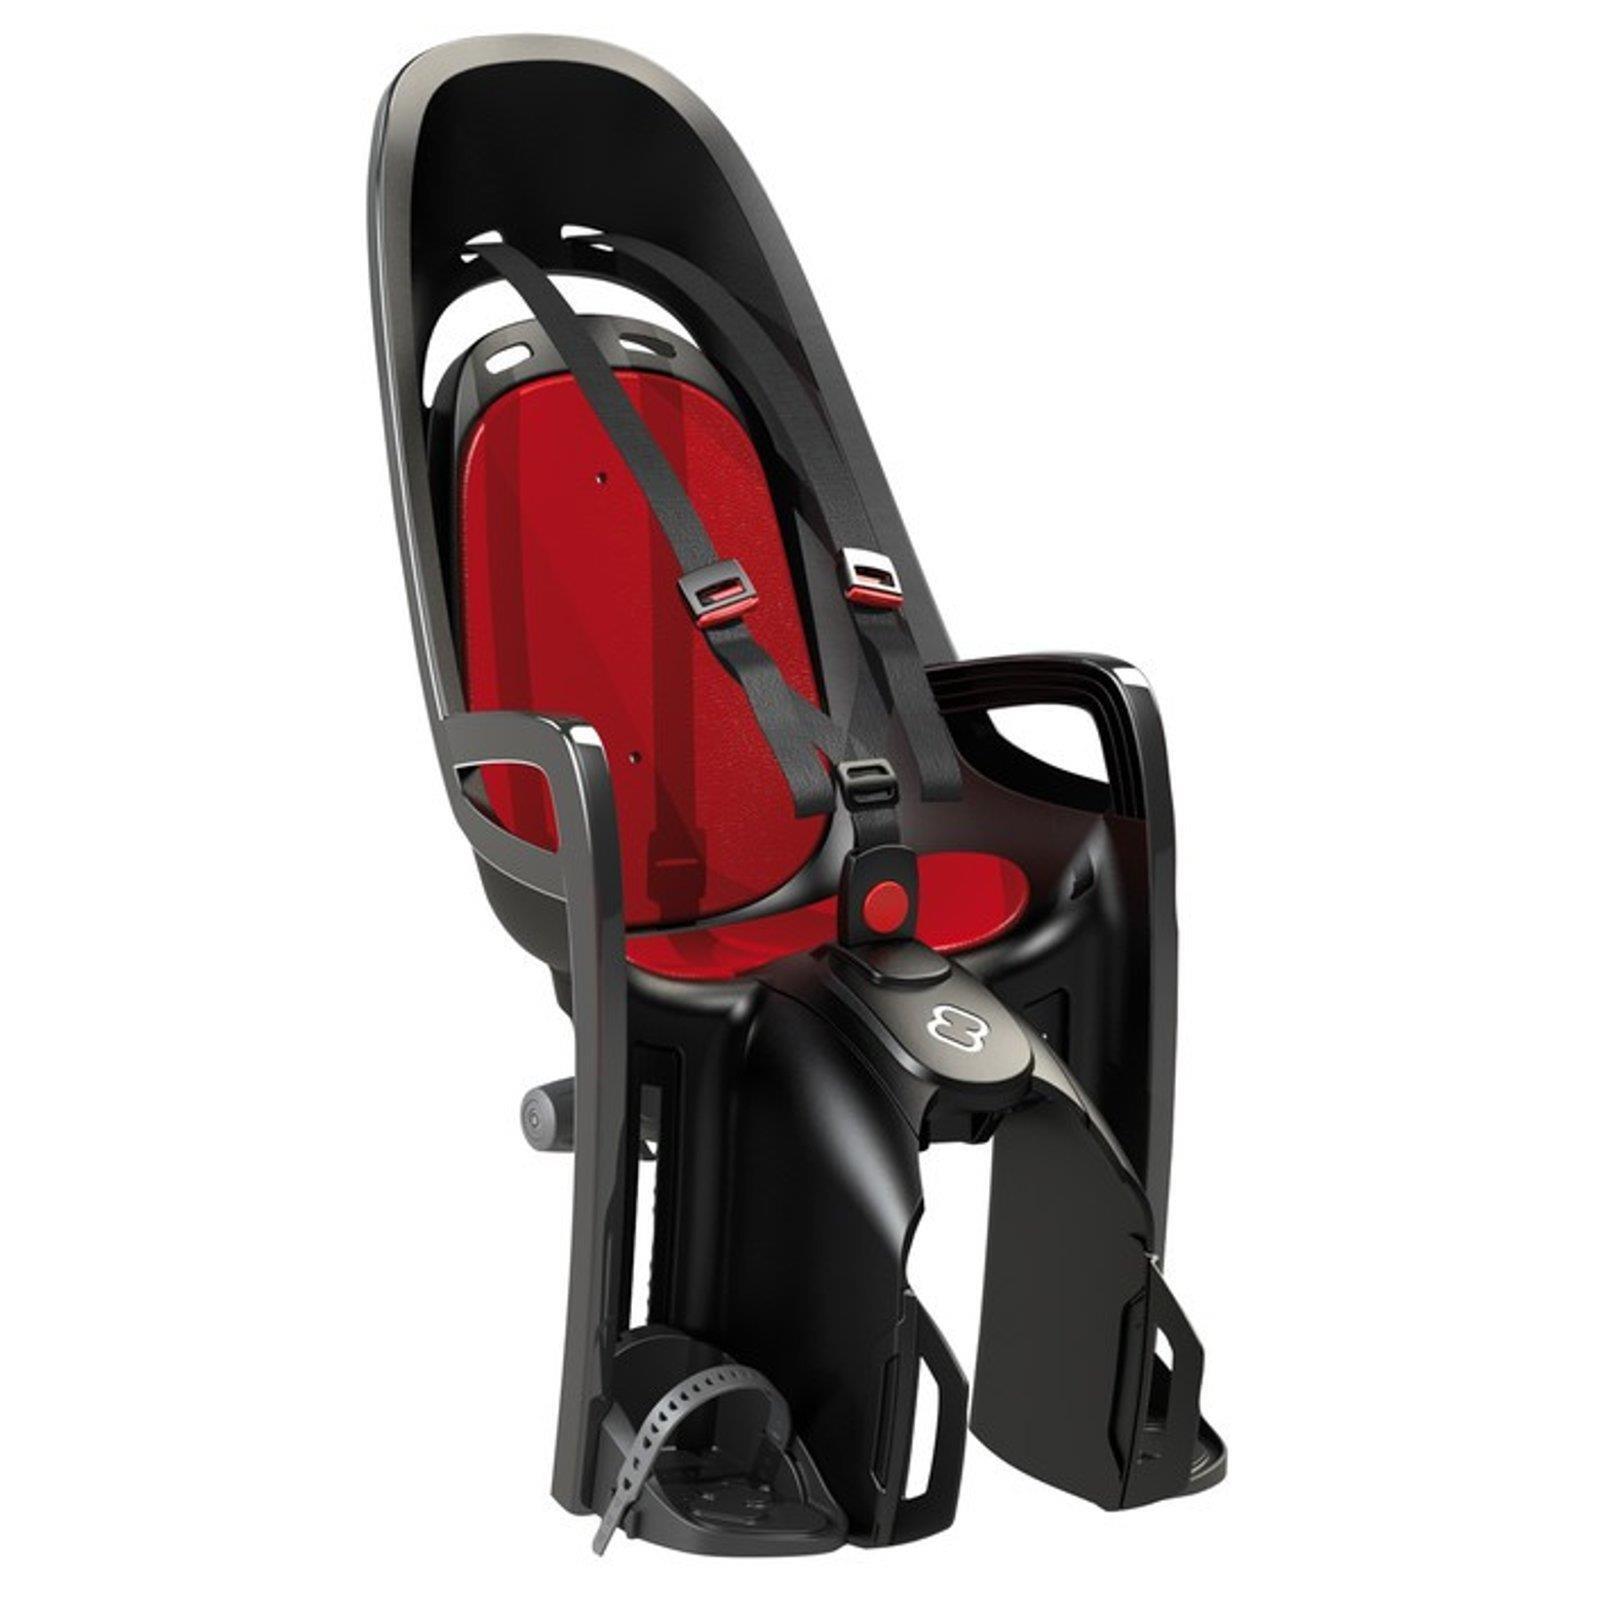 Hamax Zenith bicicleta asiento infantil portaequipajes City trekking E-Bike 9 meses 22 kg